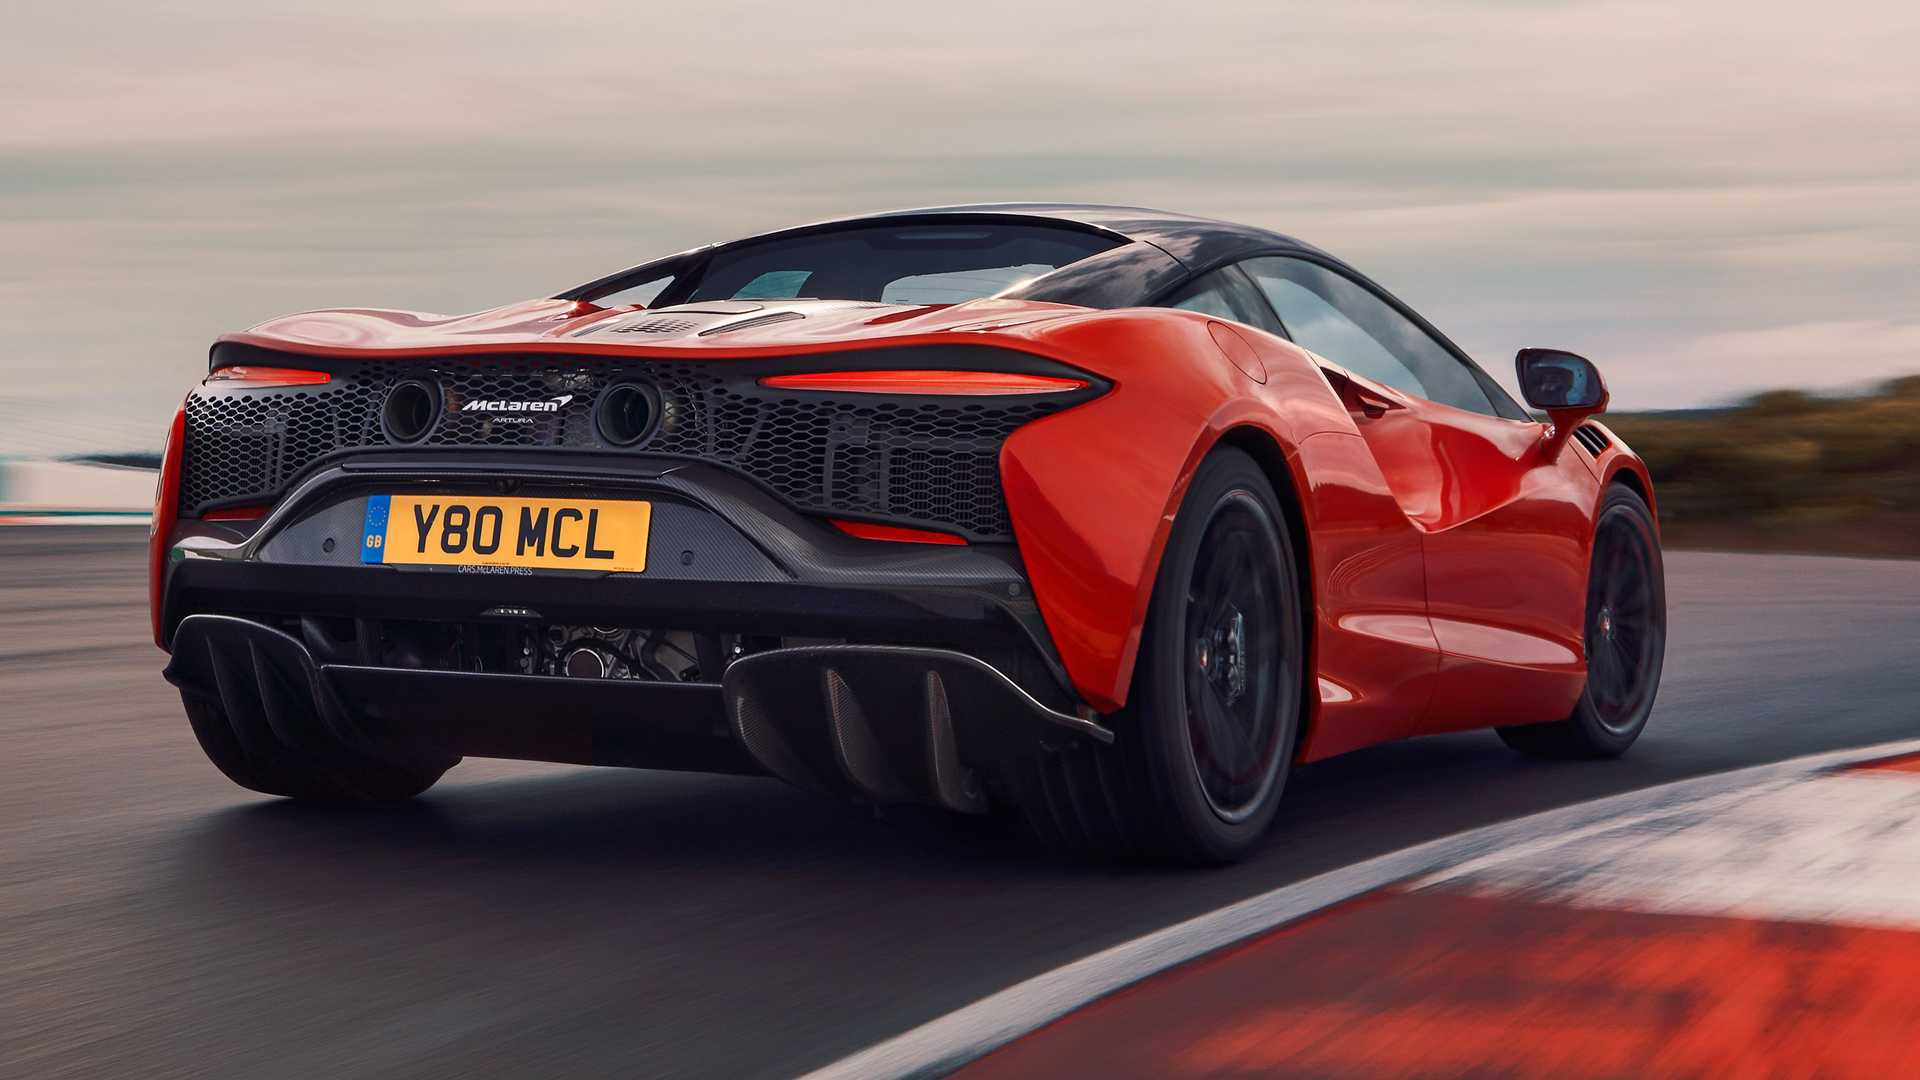 2022 McLaren Artura Rear On Track